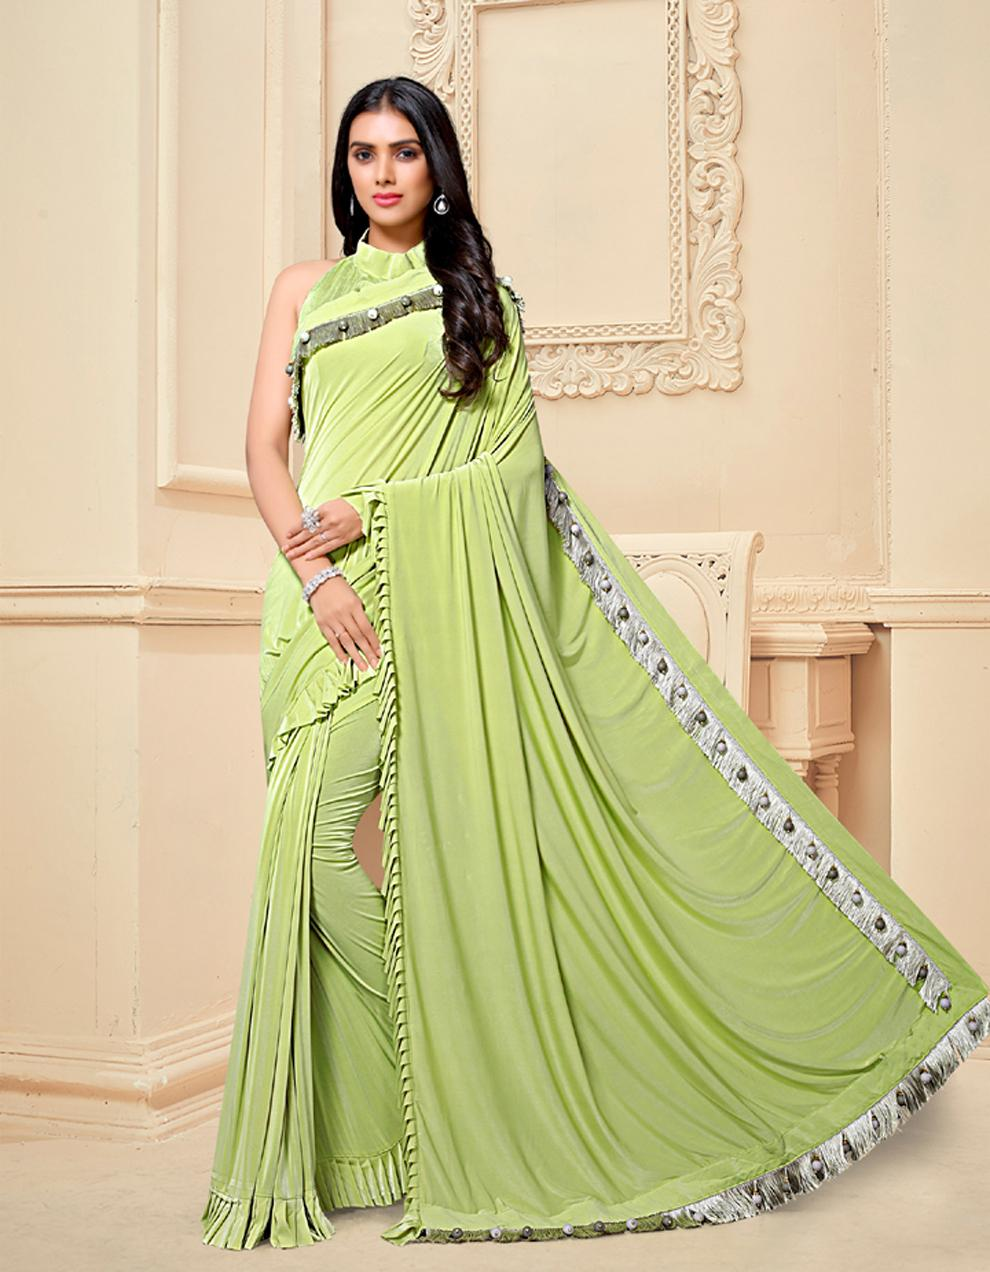 Lemon green Silk Saree With Blouse SD25174